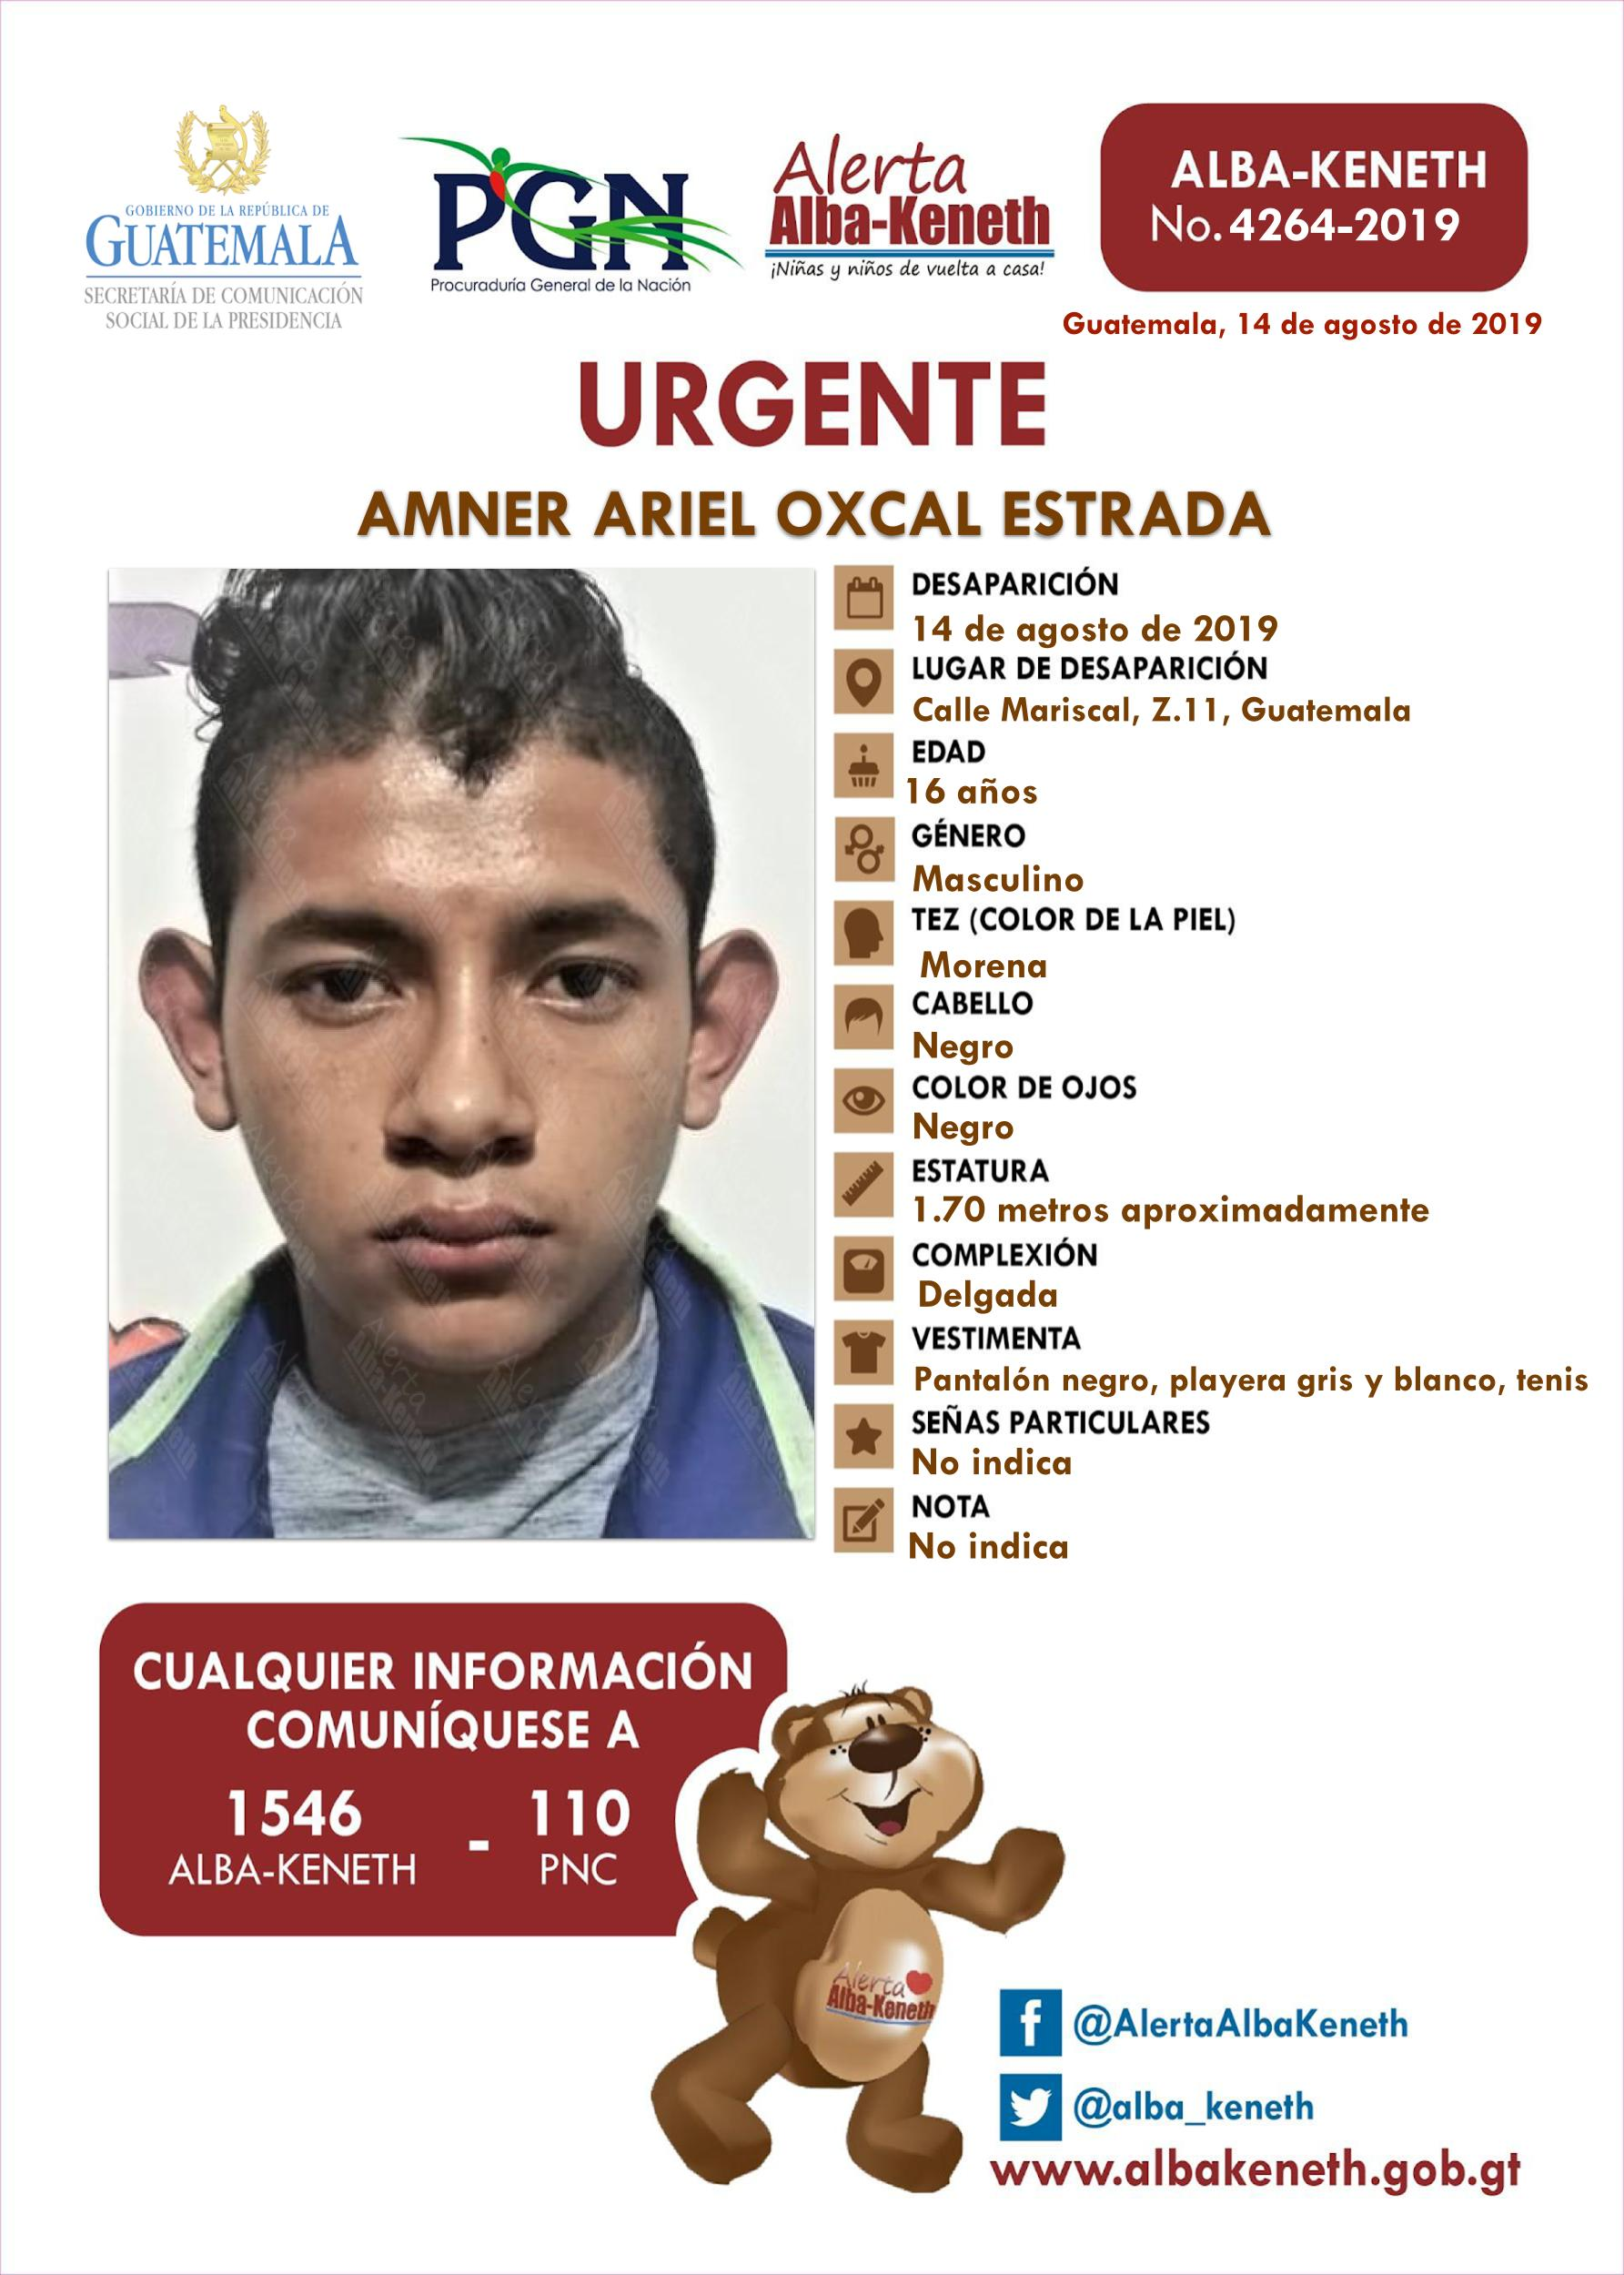 Amner Ariel Oxcal Estrada